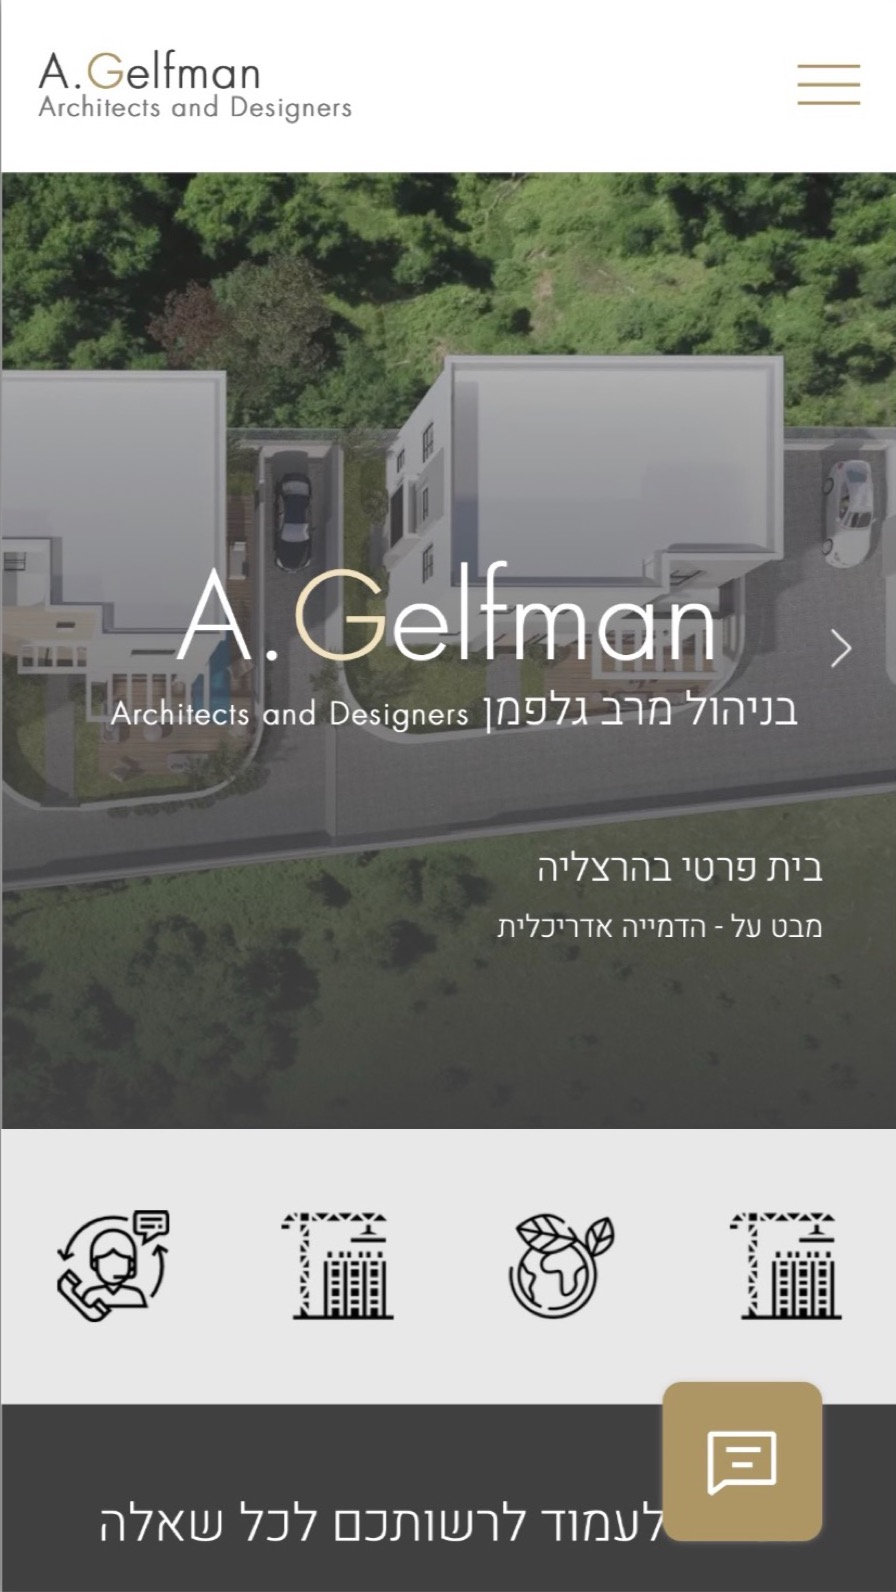 Agelfman.com